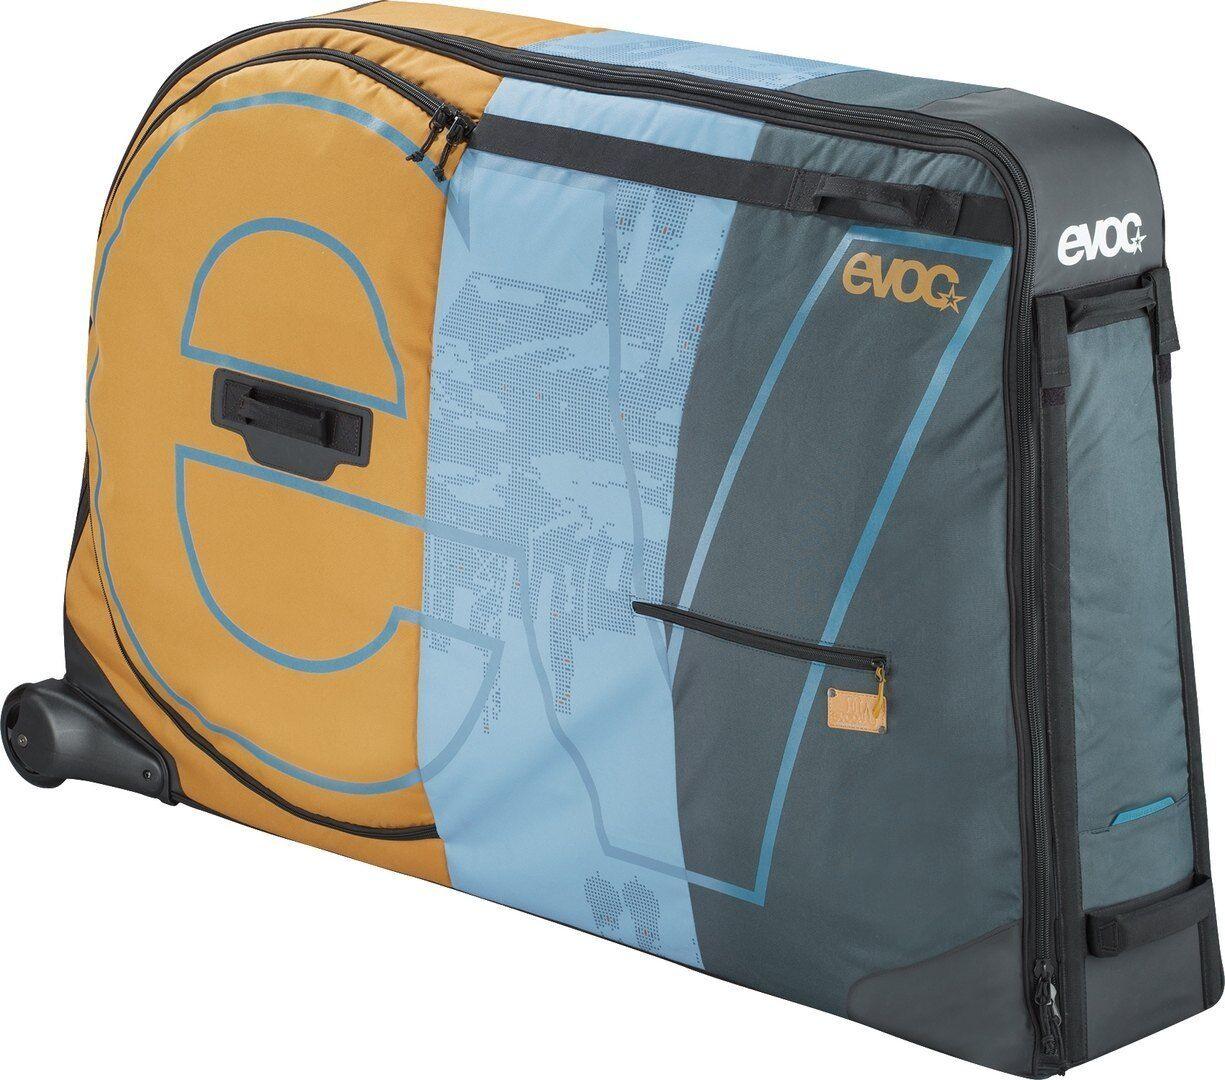 Evoc Bike Travel Bag 285L Multicolored One Size